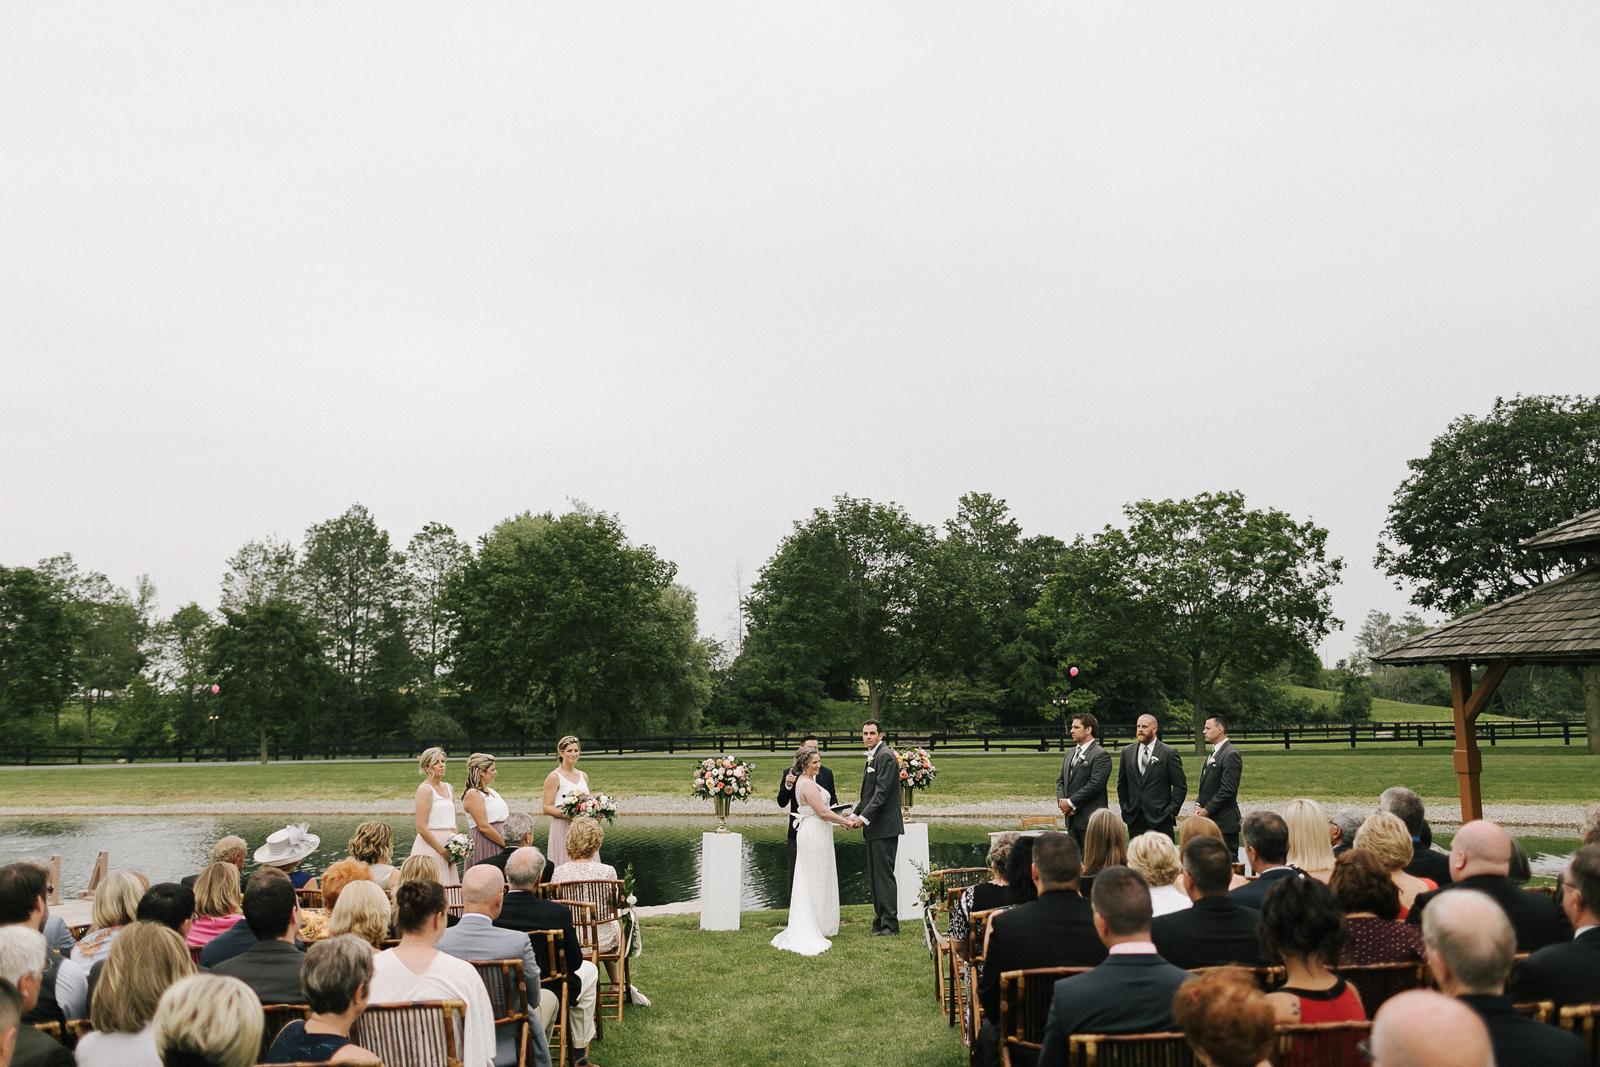 mike-and-jenni-wedding-249.jpg